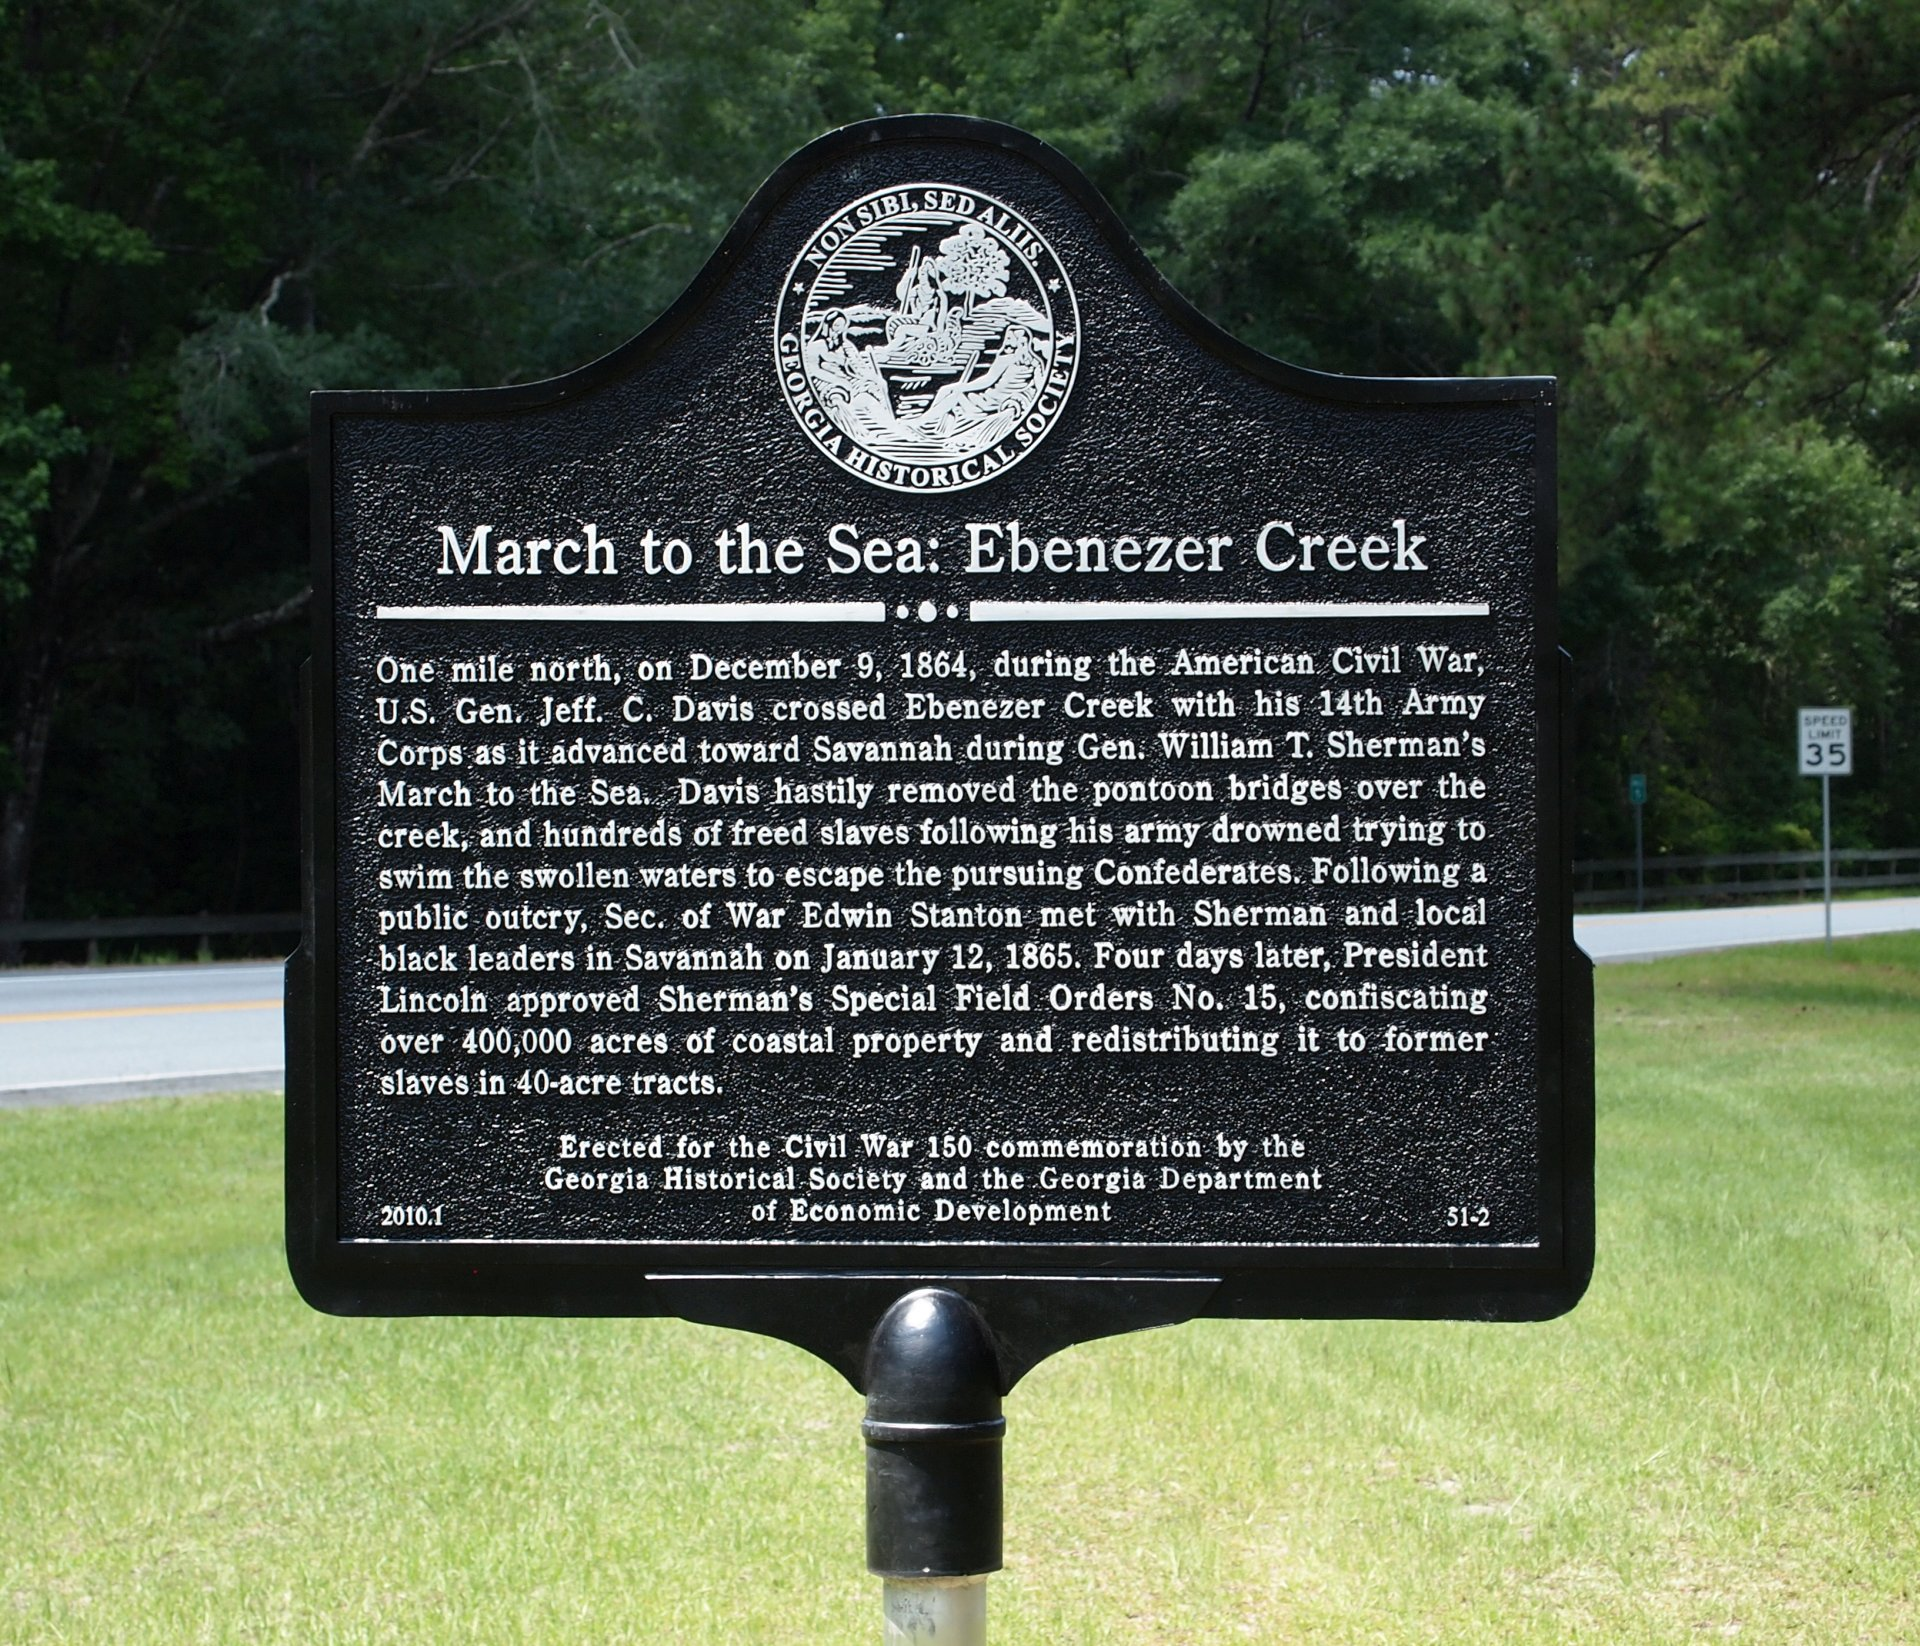 Ebenezer Creek Highway Marker